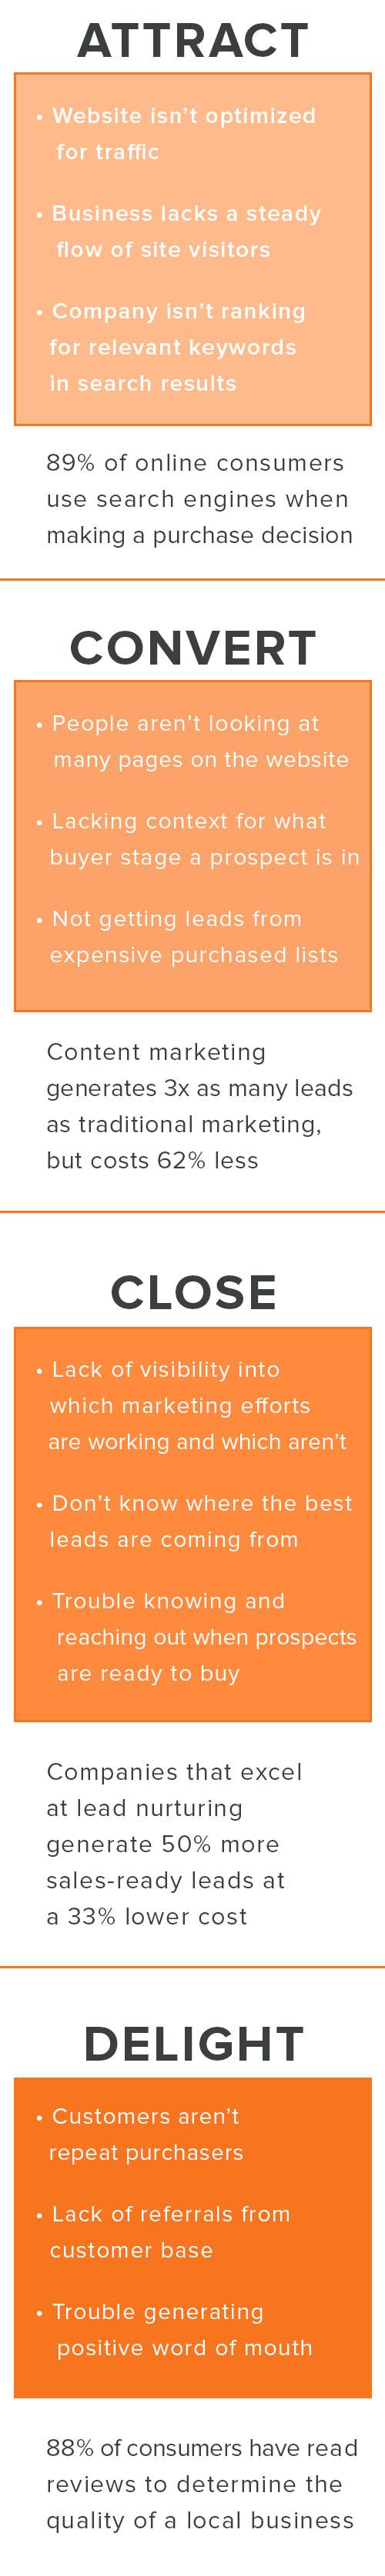 Sales_Walk_Through_Funnel_Graphic_MOBILE_Business_Challenge.jpg